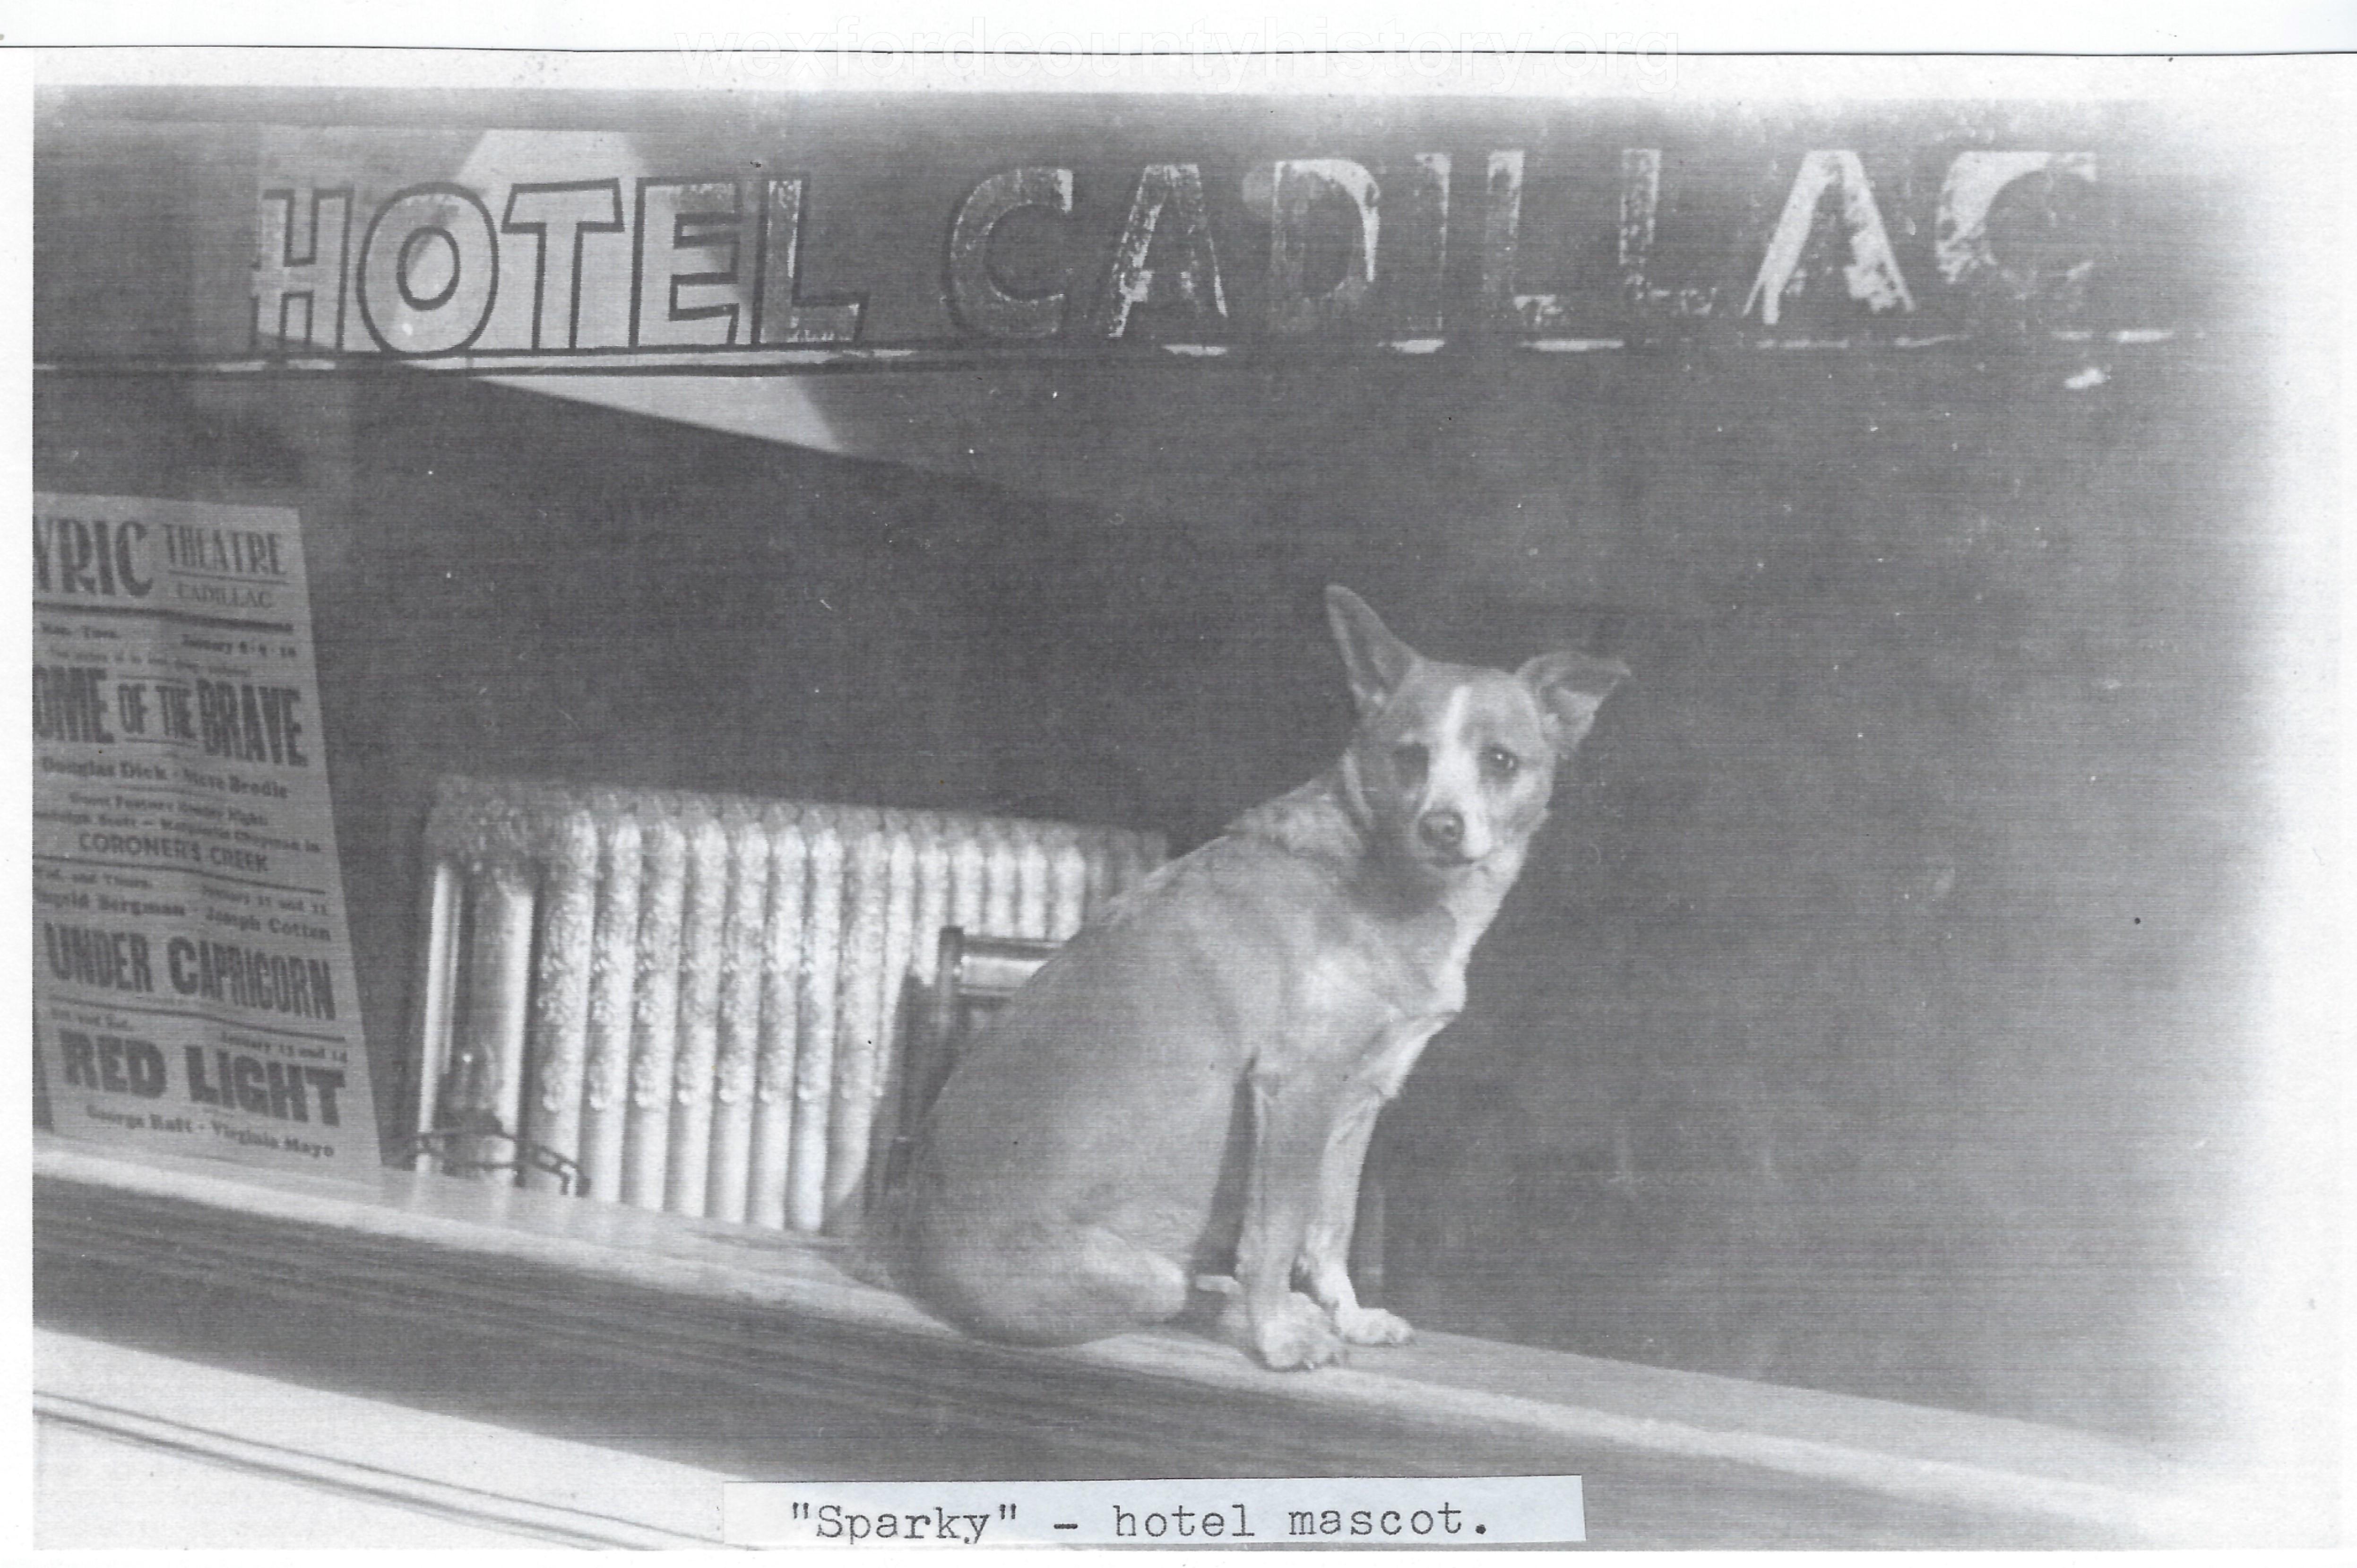 Hotel Cadillac Mascot, Sparky The Dog